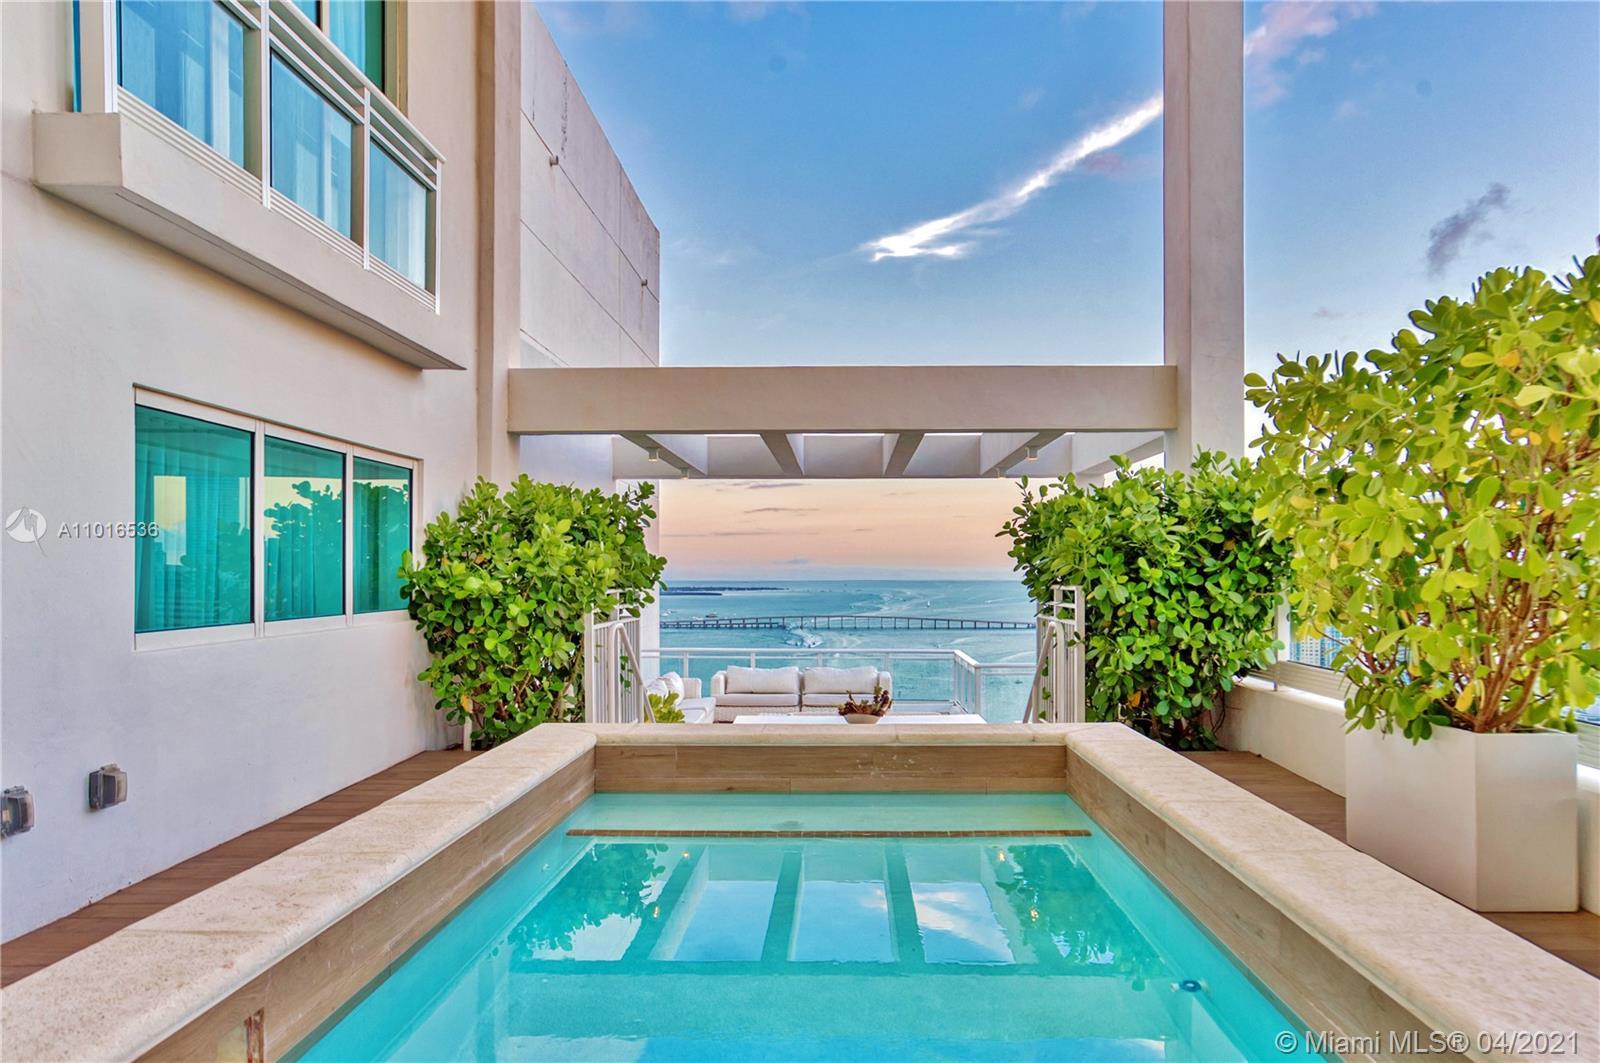 900 Brickell Key Blvd, Unit #PH4 Luxury Real Estate